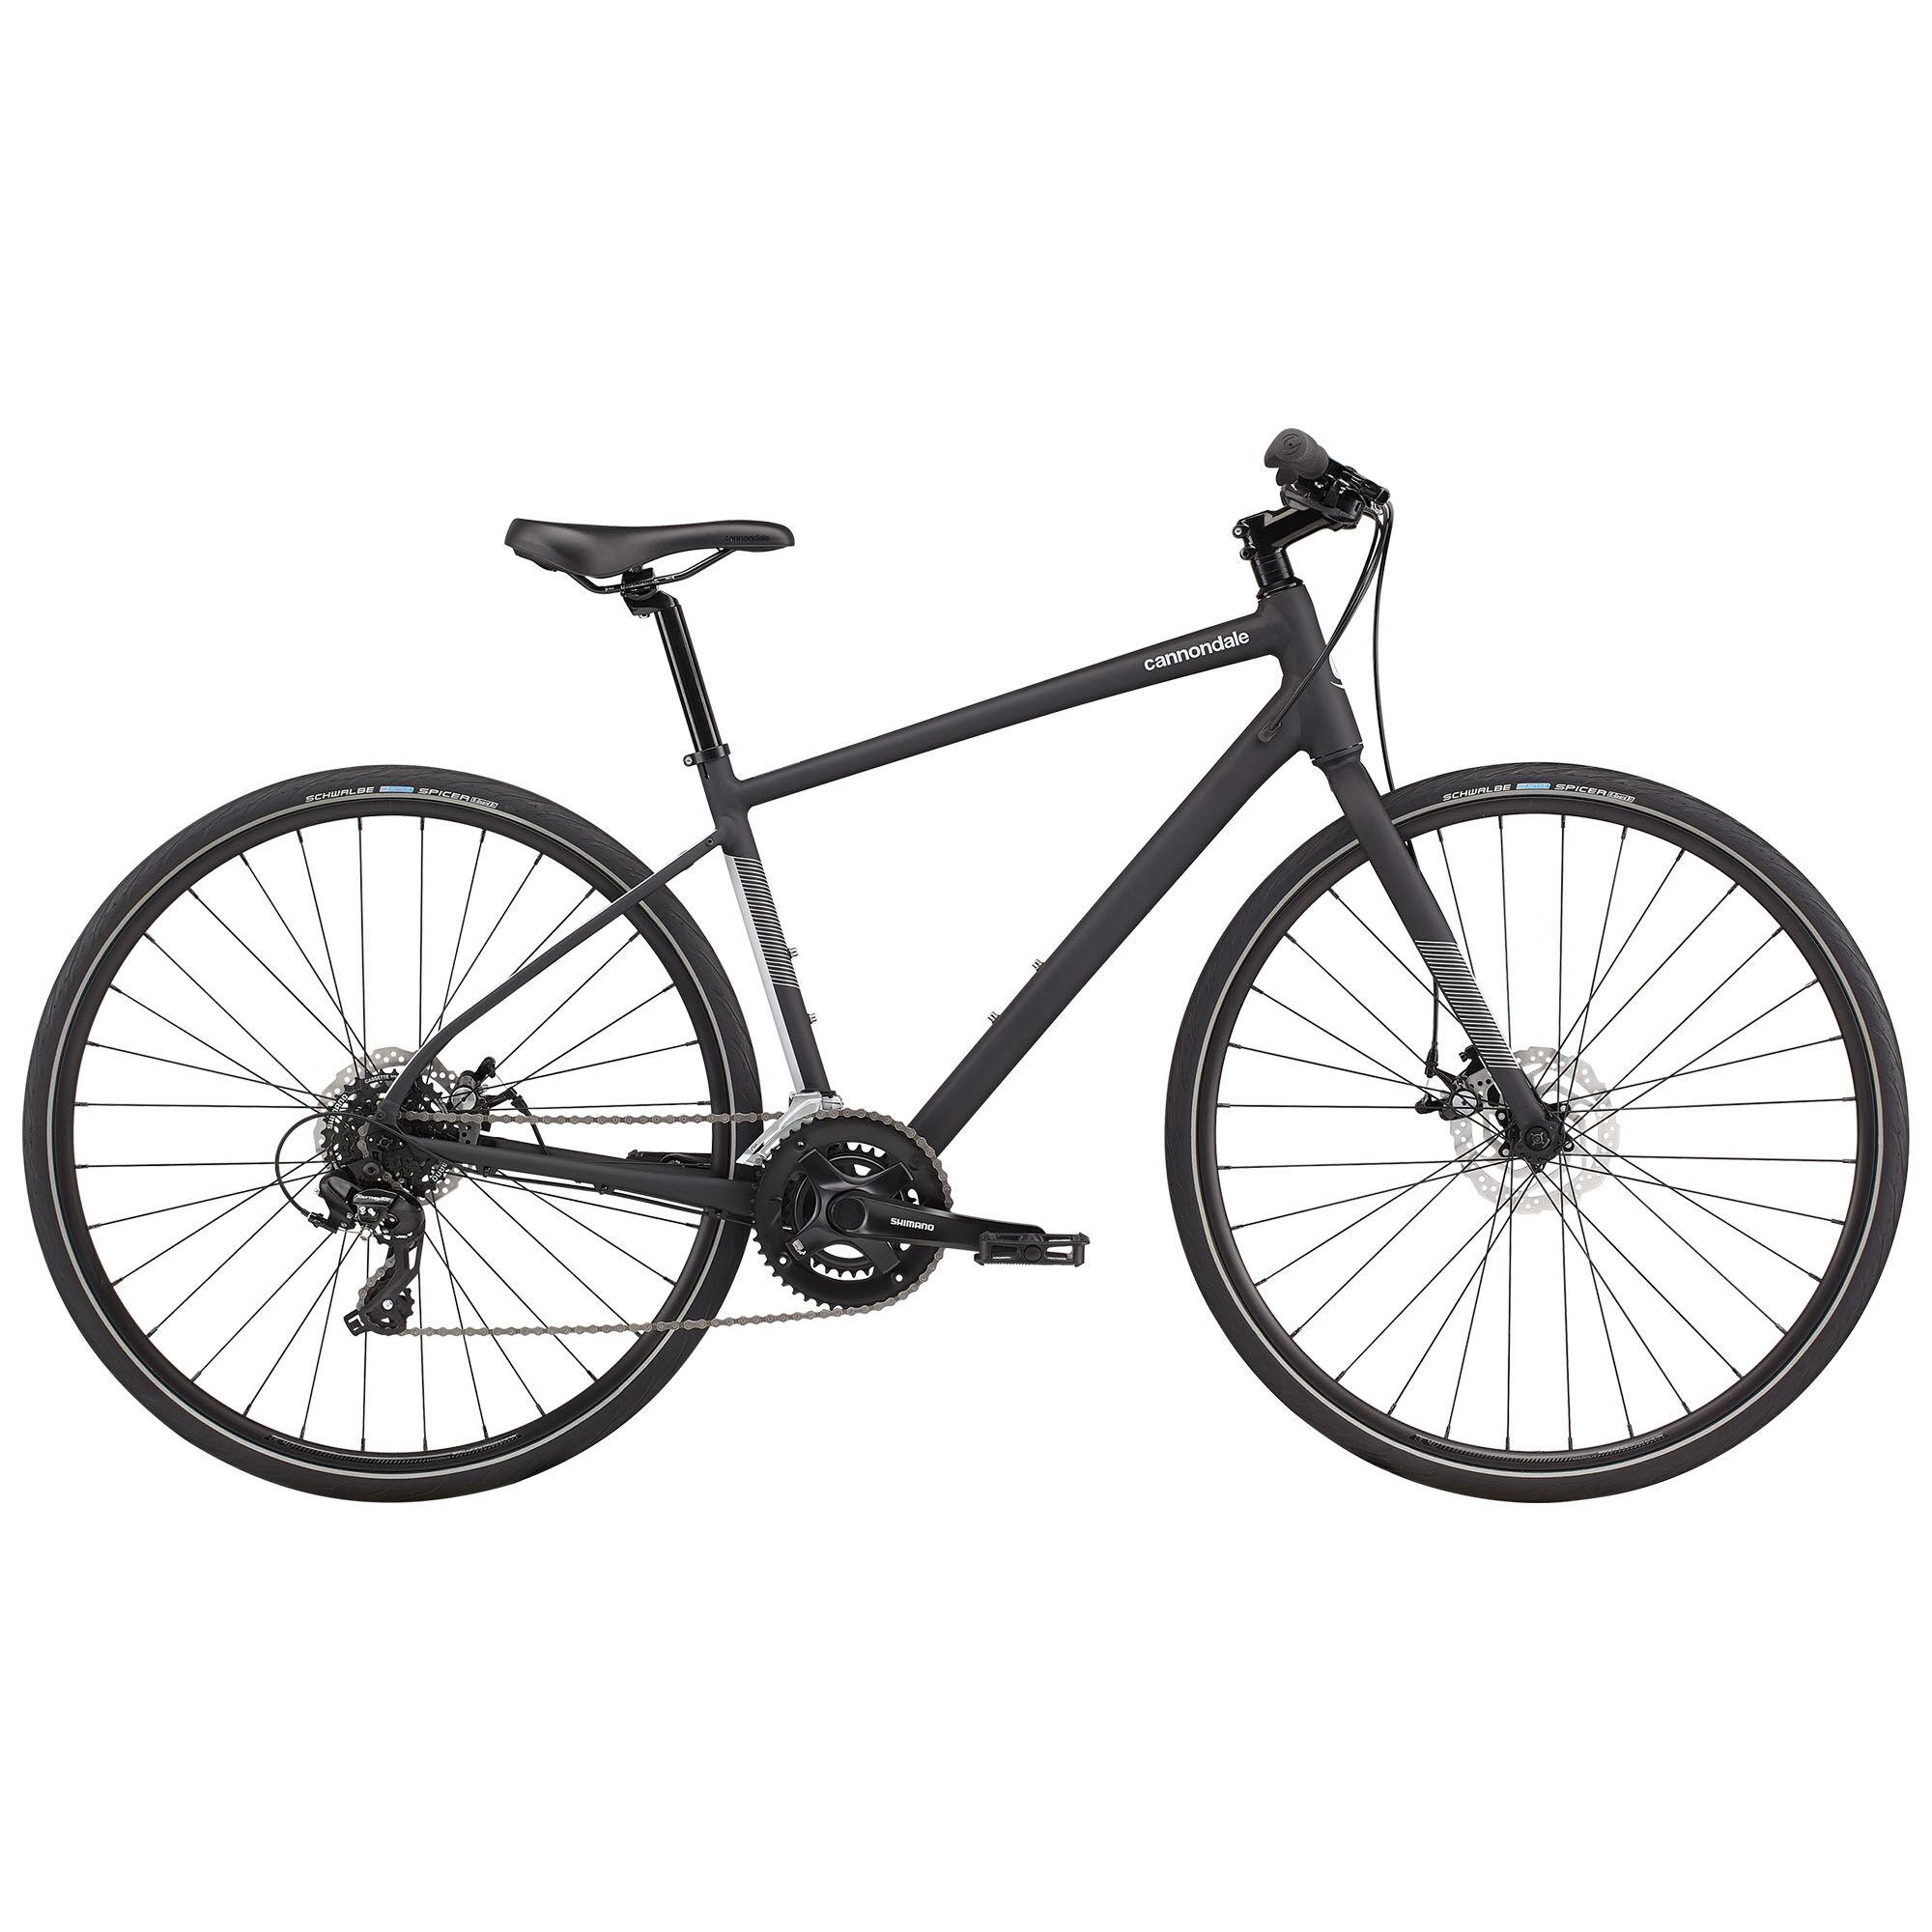 Cannondale Quick 5 Urban Bike '21  - Matte Black - Size: Extra Large